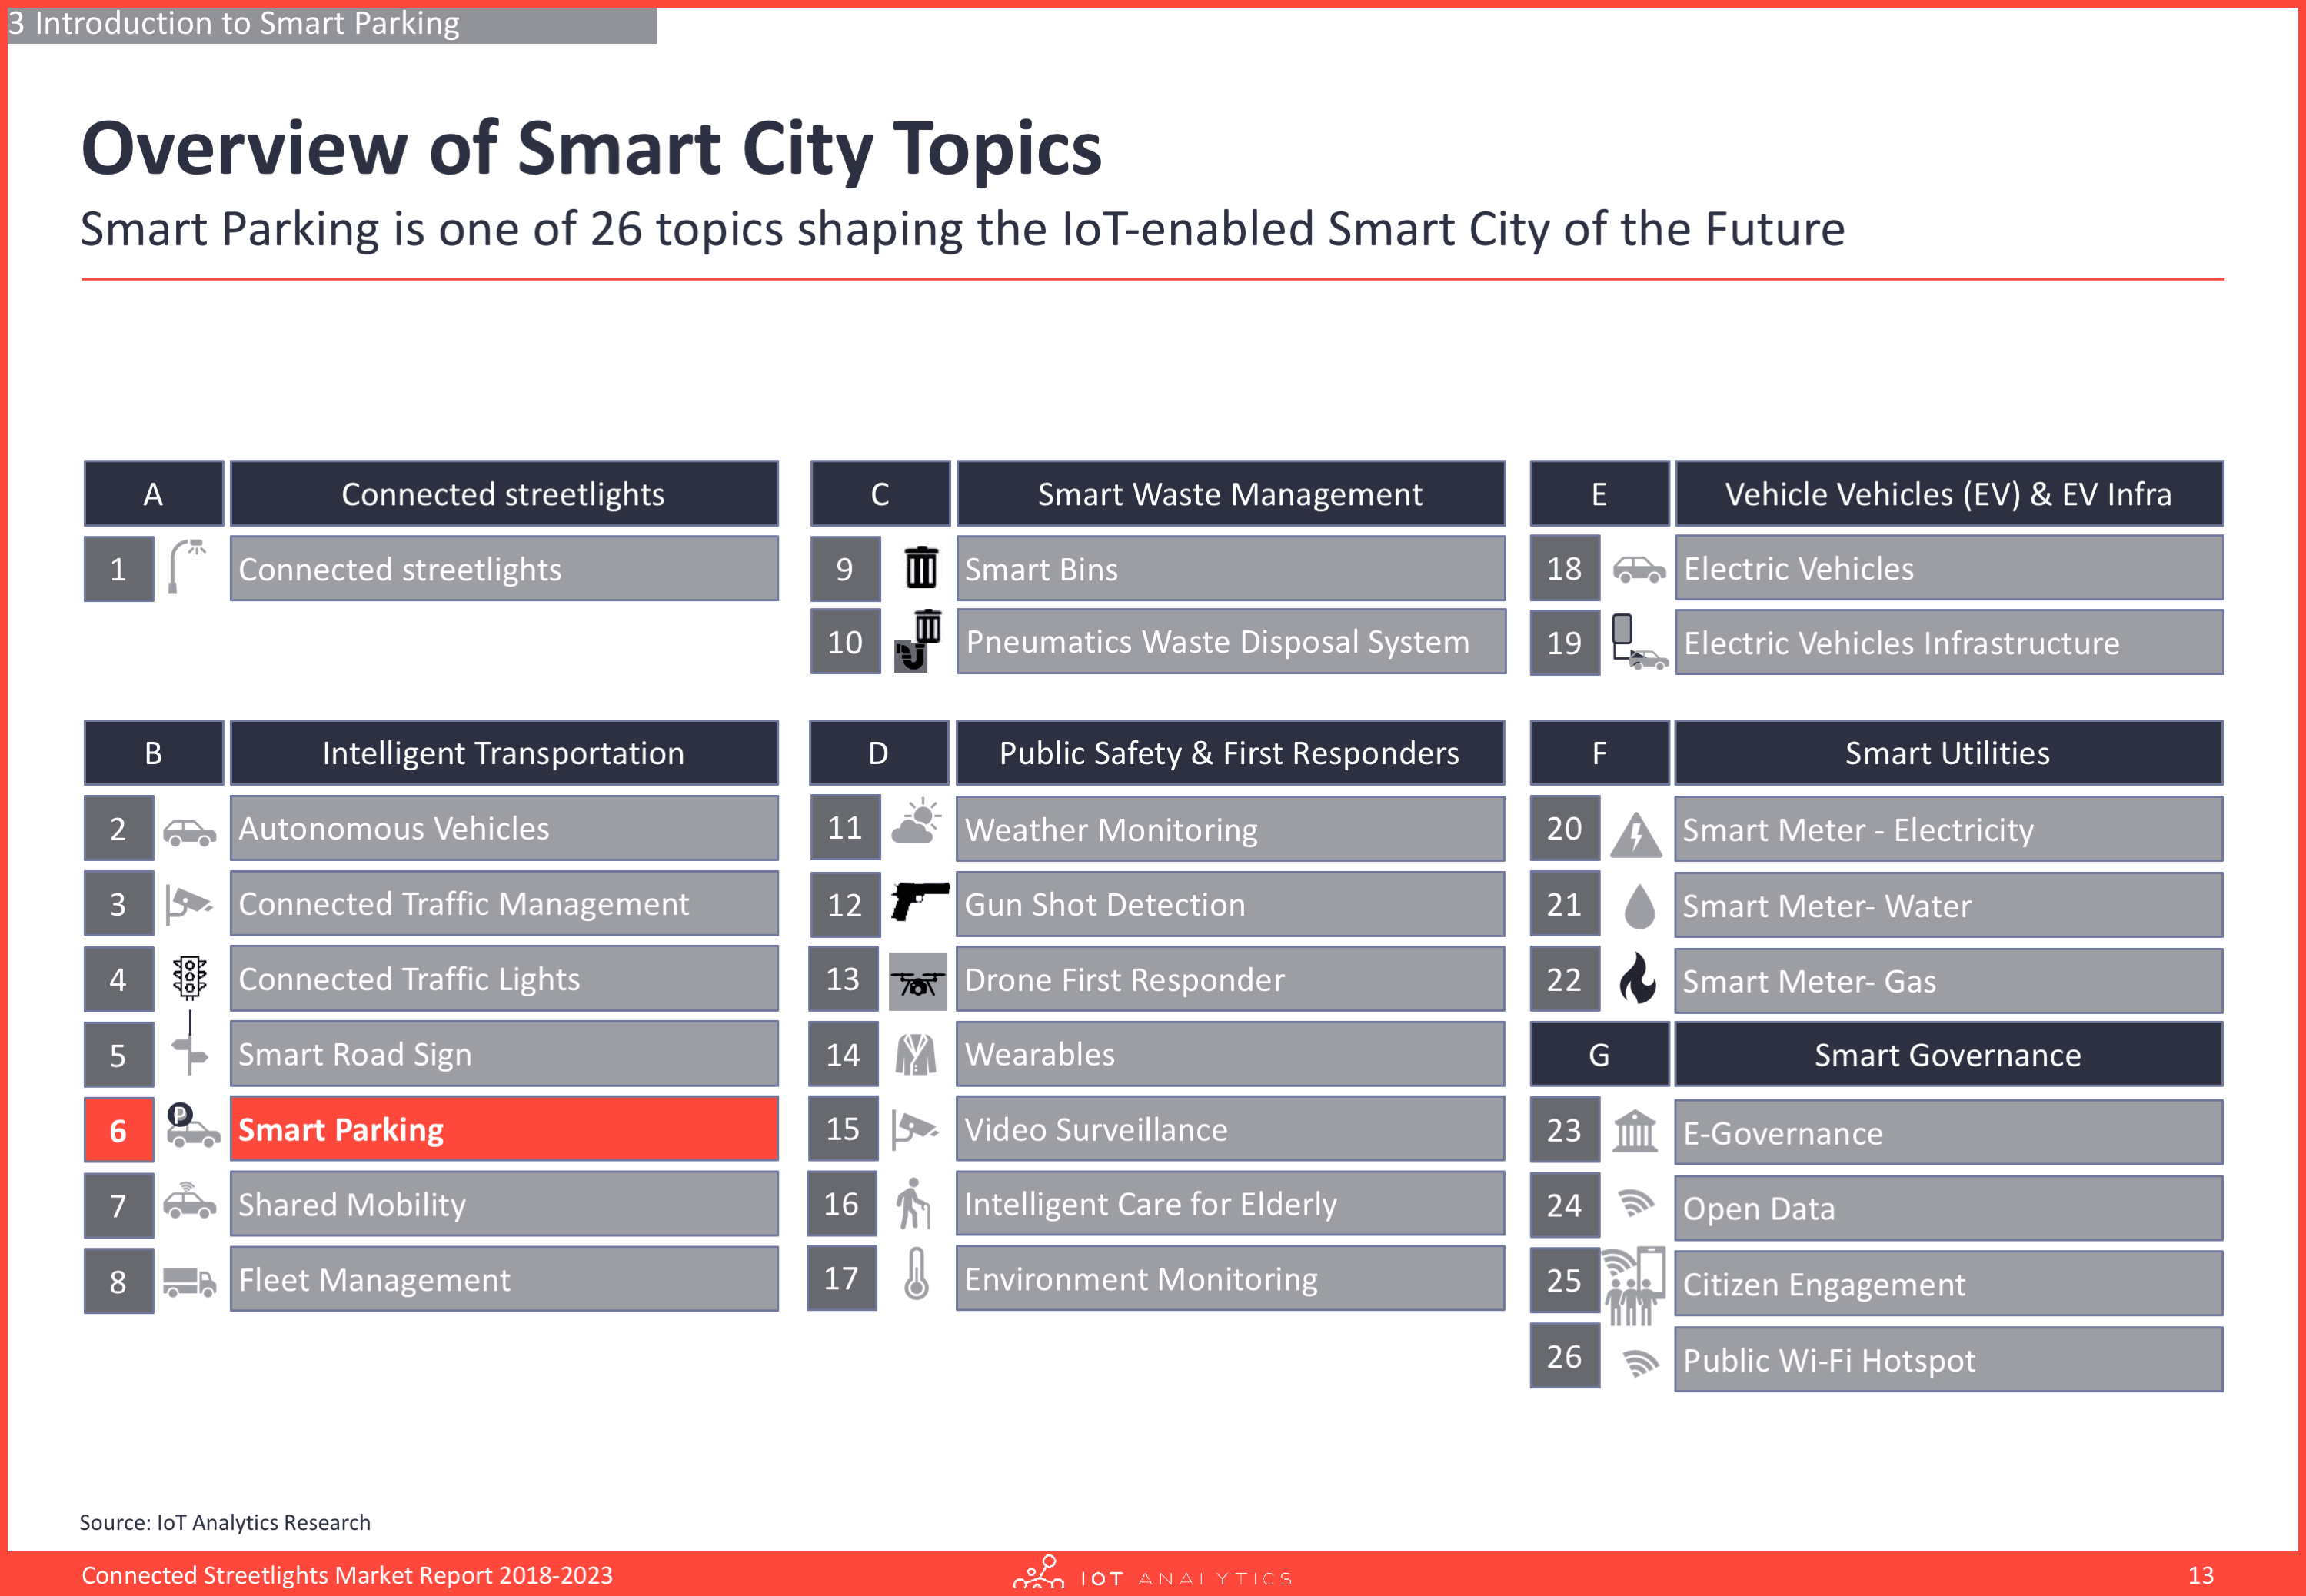 Overview of smart city topics